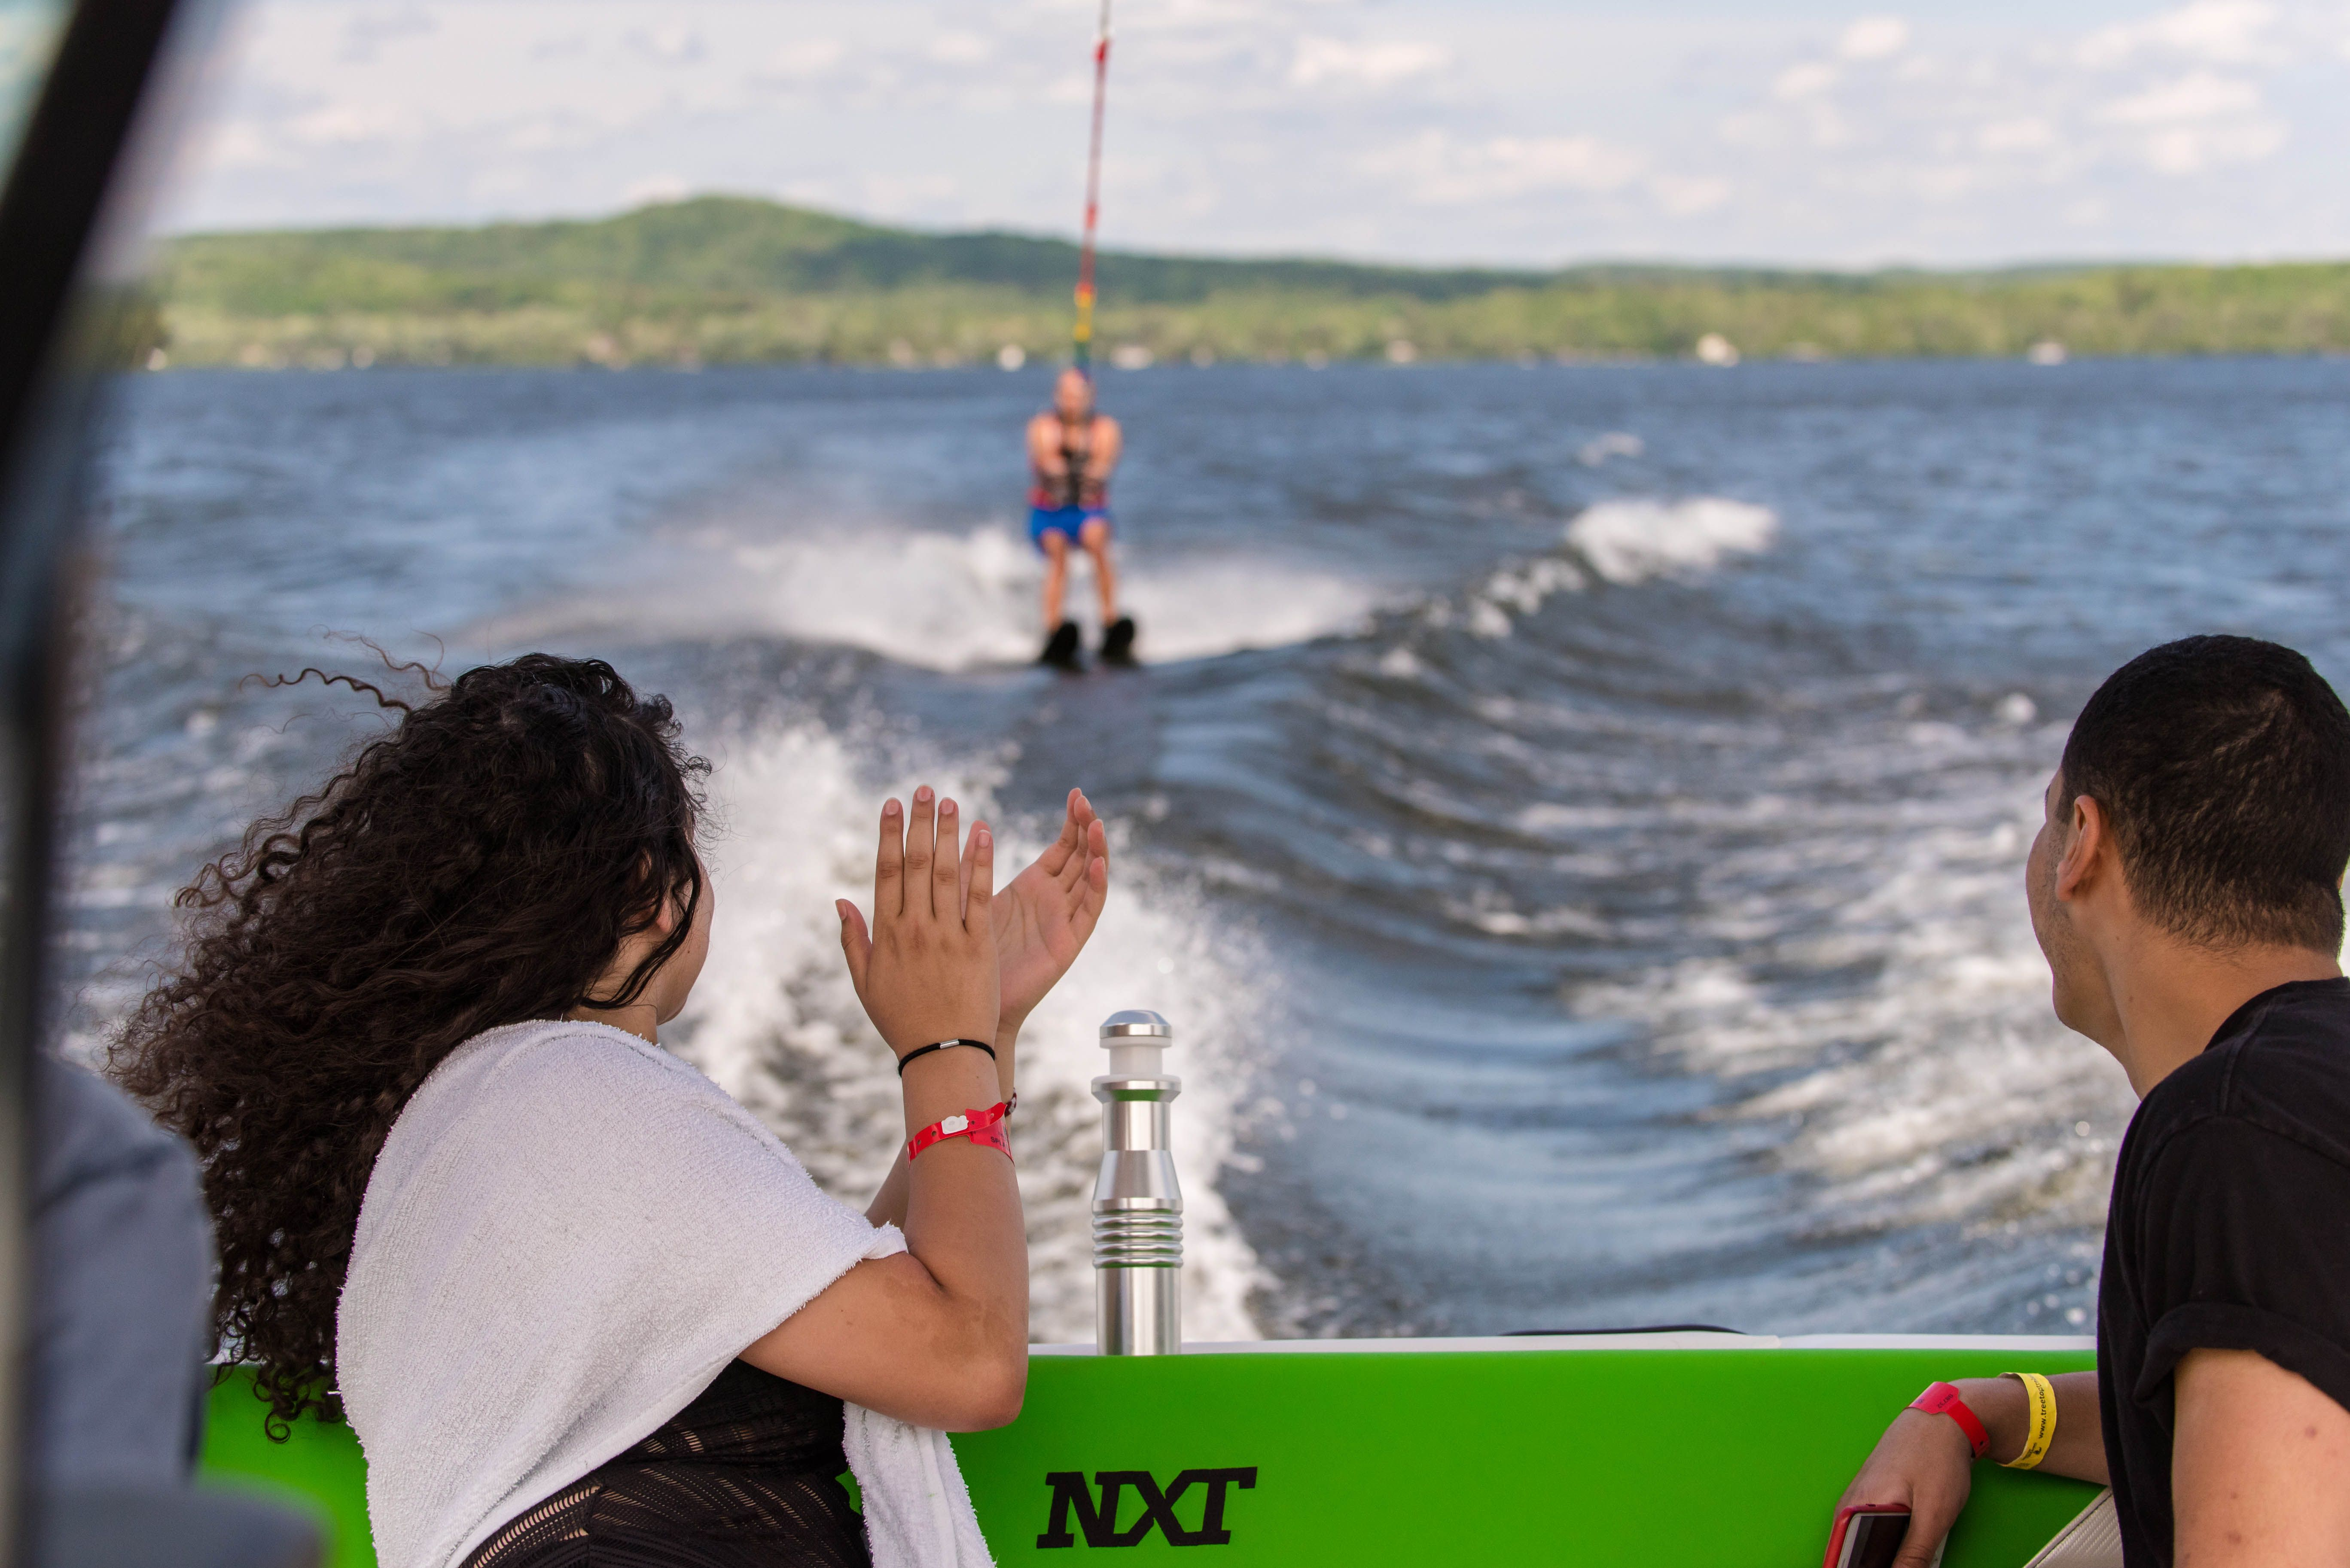 On the Lake at Deerhurst Resort in Muskoka! Resort